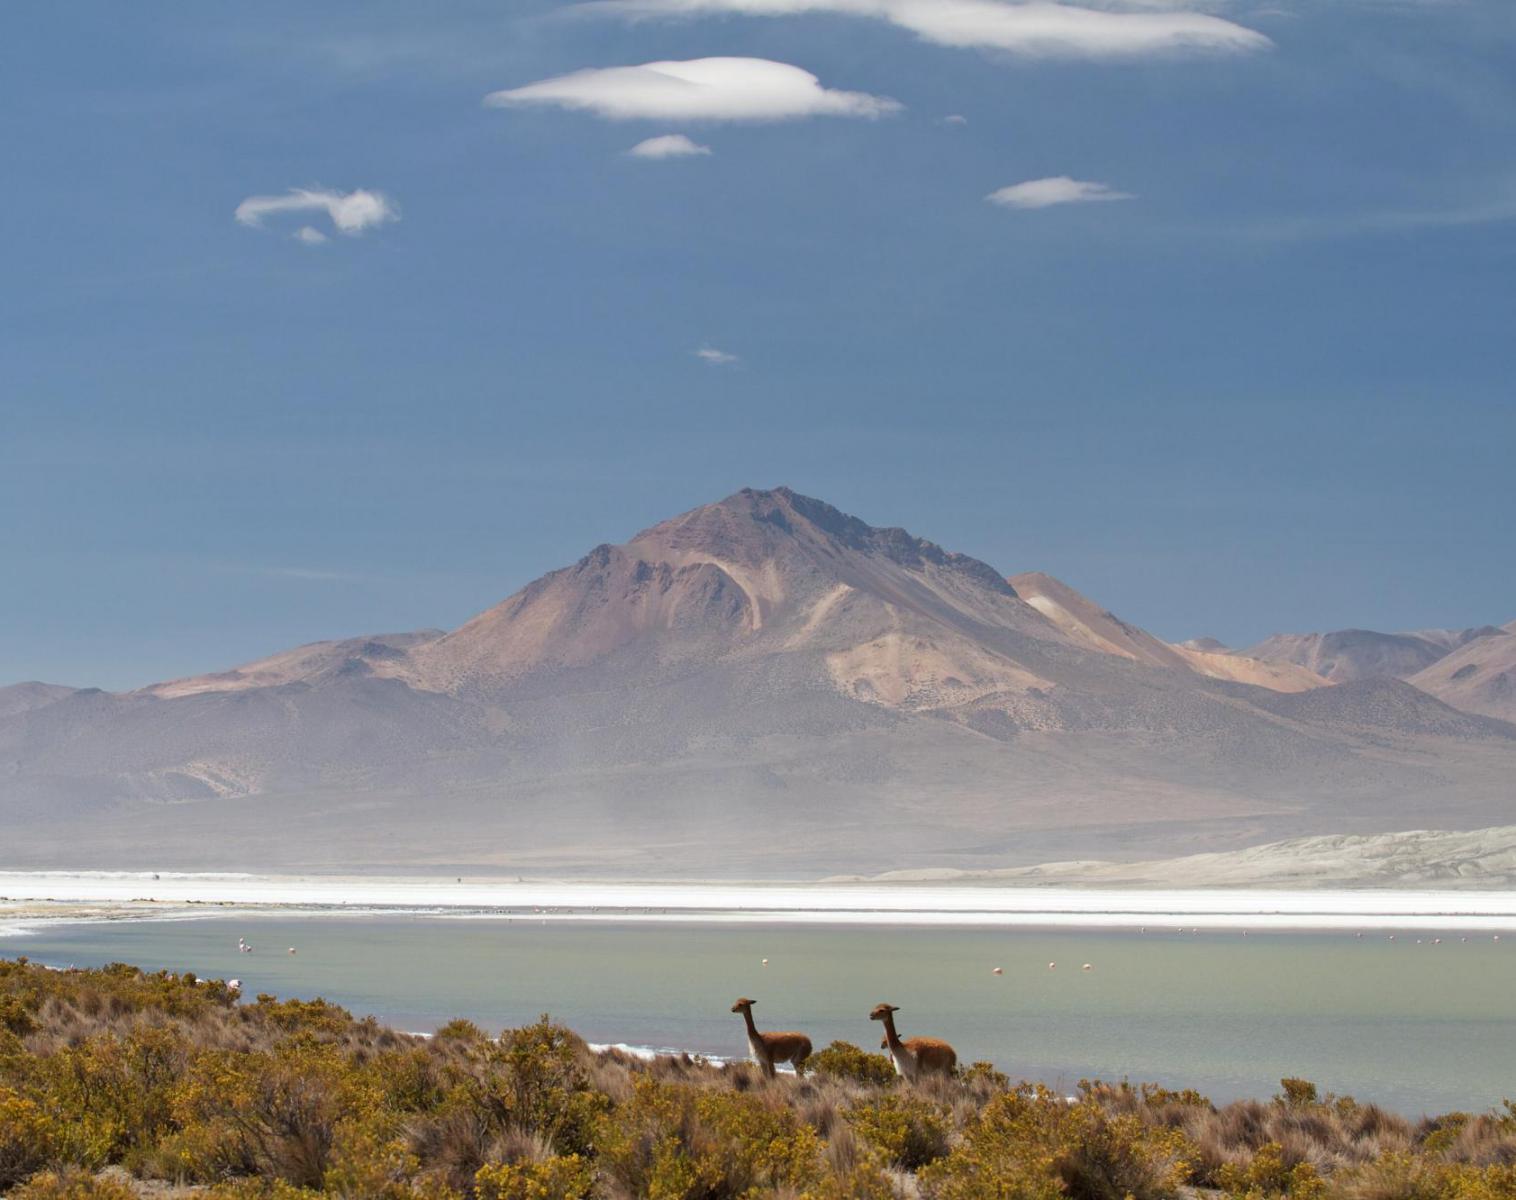 Chili  Chili, Bolivie : Trek au sommet de l'Atacama   Trek & Randonnée Photo Observation nature